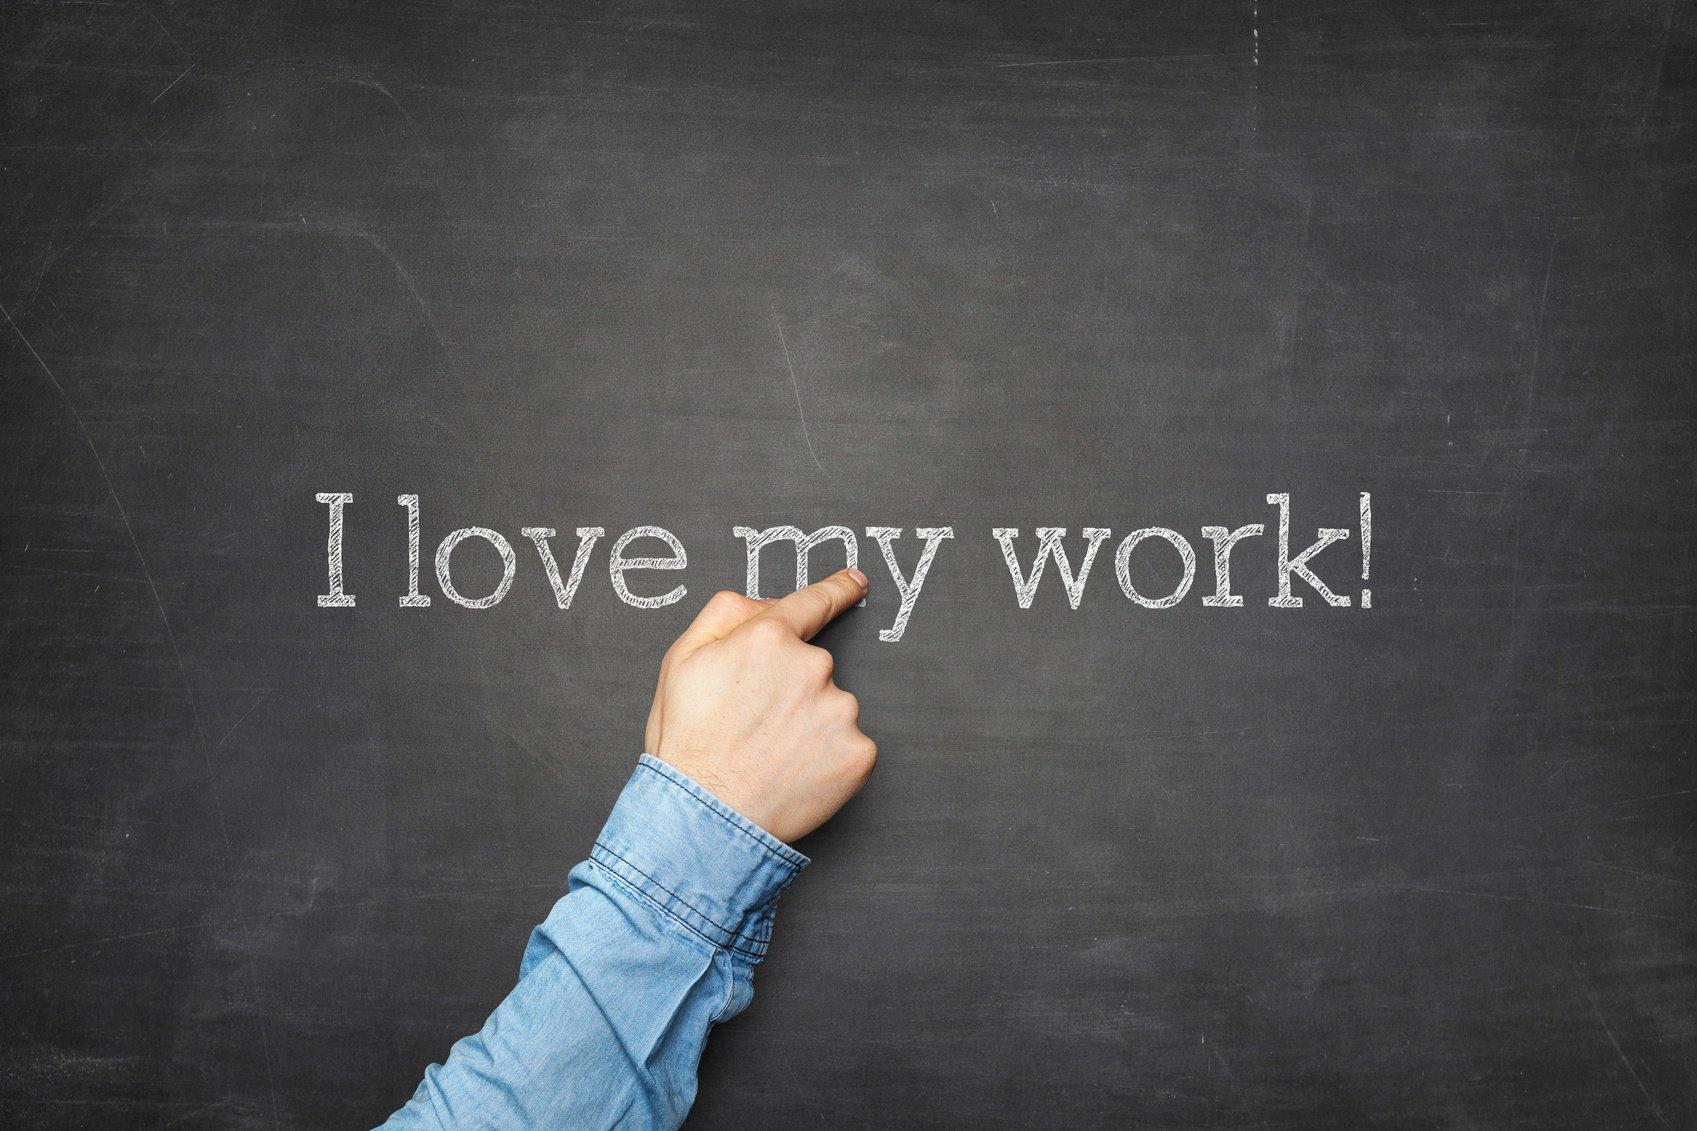 employee_appreciation-1.jpg